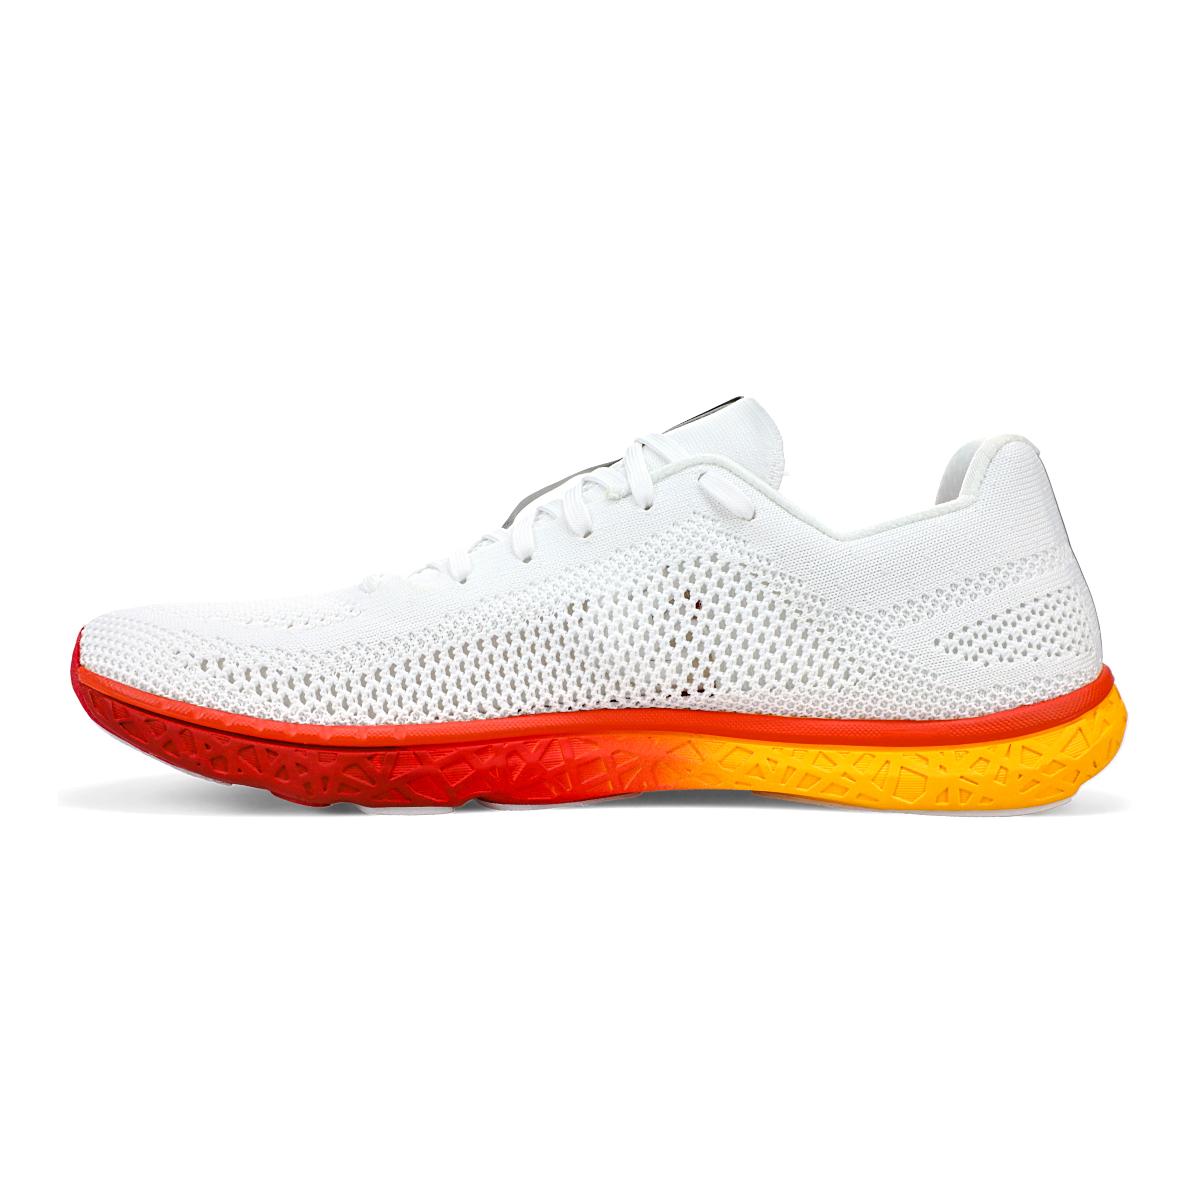 Men's Altra Escalante Racer Running Shoe - Color: White/Orange - Size: 7 - Width: Regular, White/Orange, large, image 2